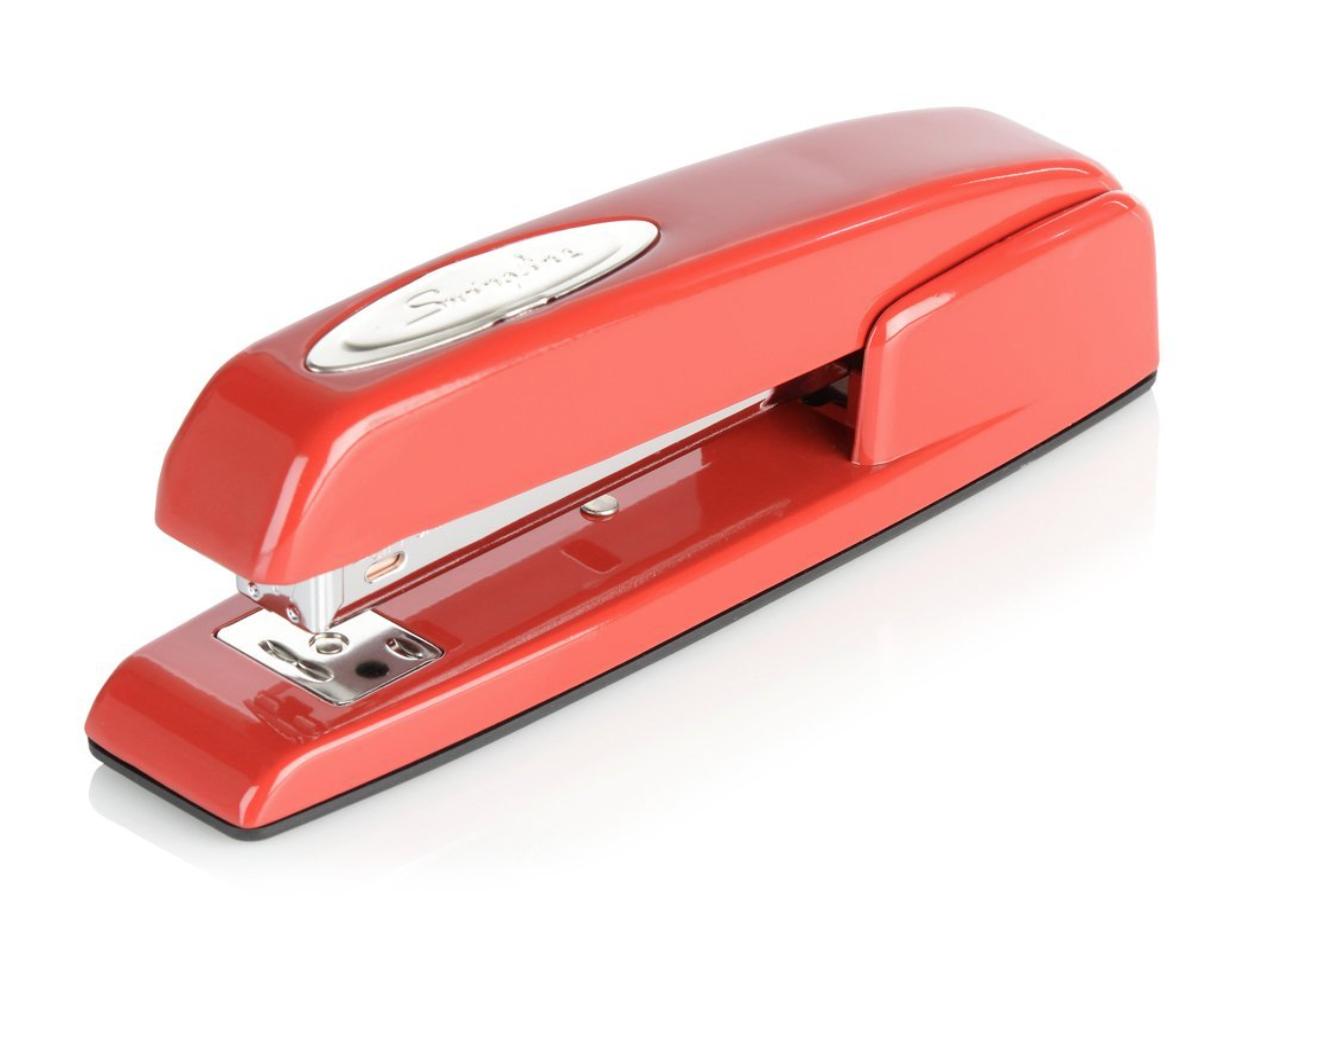 Swingline Stapler - From Amazon:Best heavy duty classroom stapler you'll ever find.